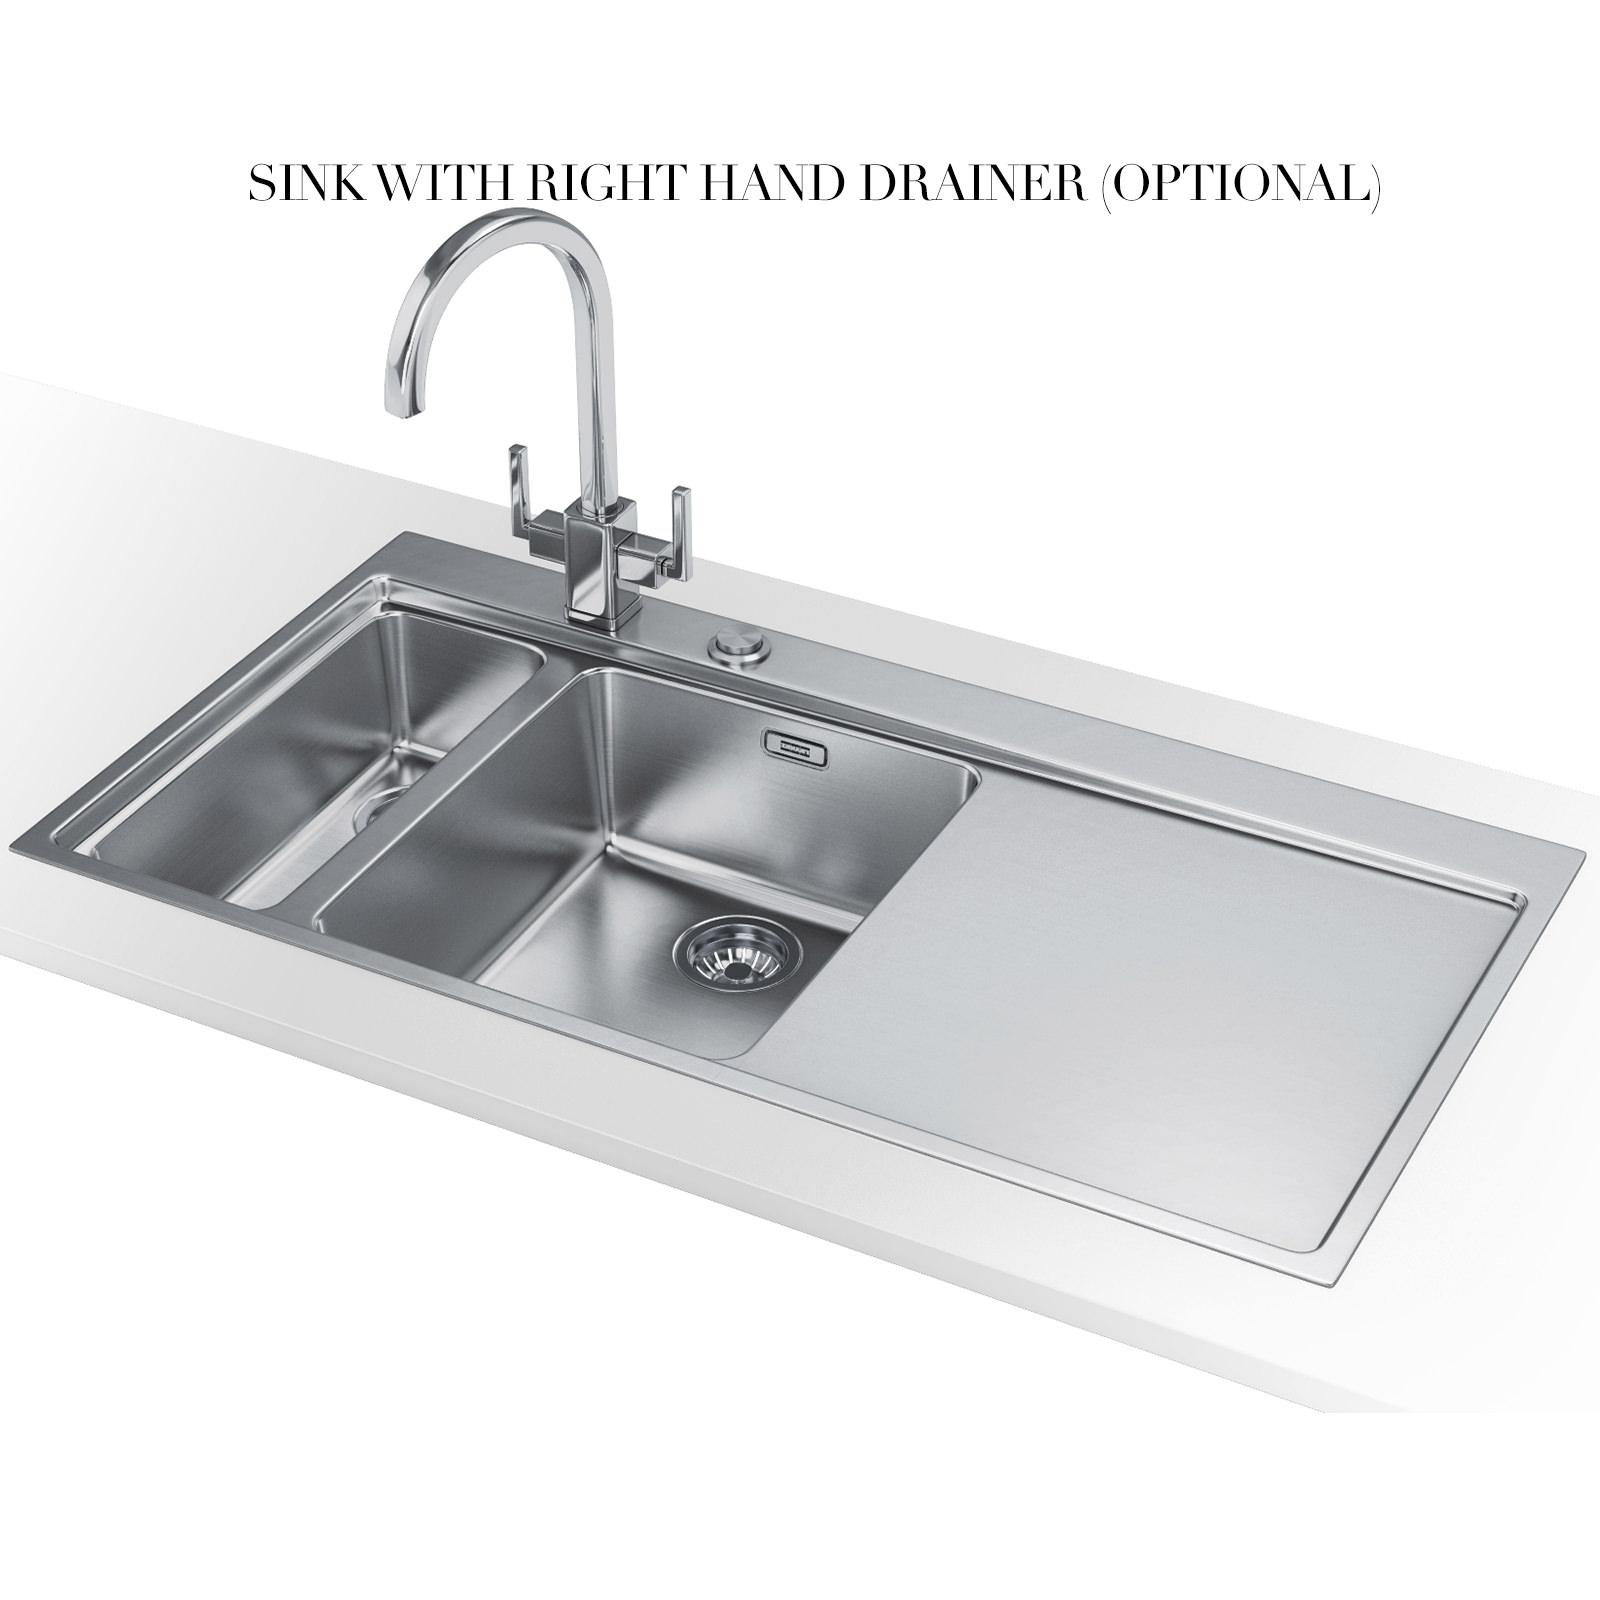 Franke Mythos Stainless Steel Sink : ... of Franke Mythos MMX 261 Slim-Top 1.5 Bowl Stainless Steel Inset Sink